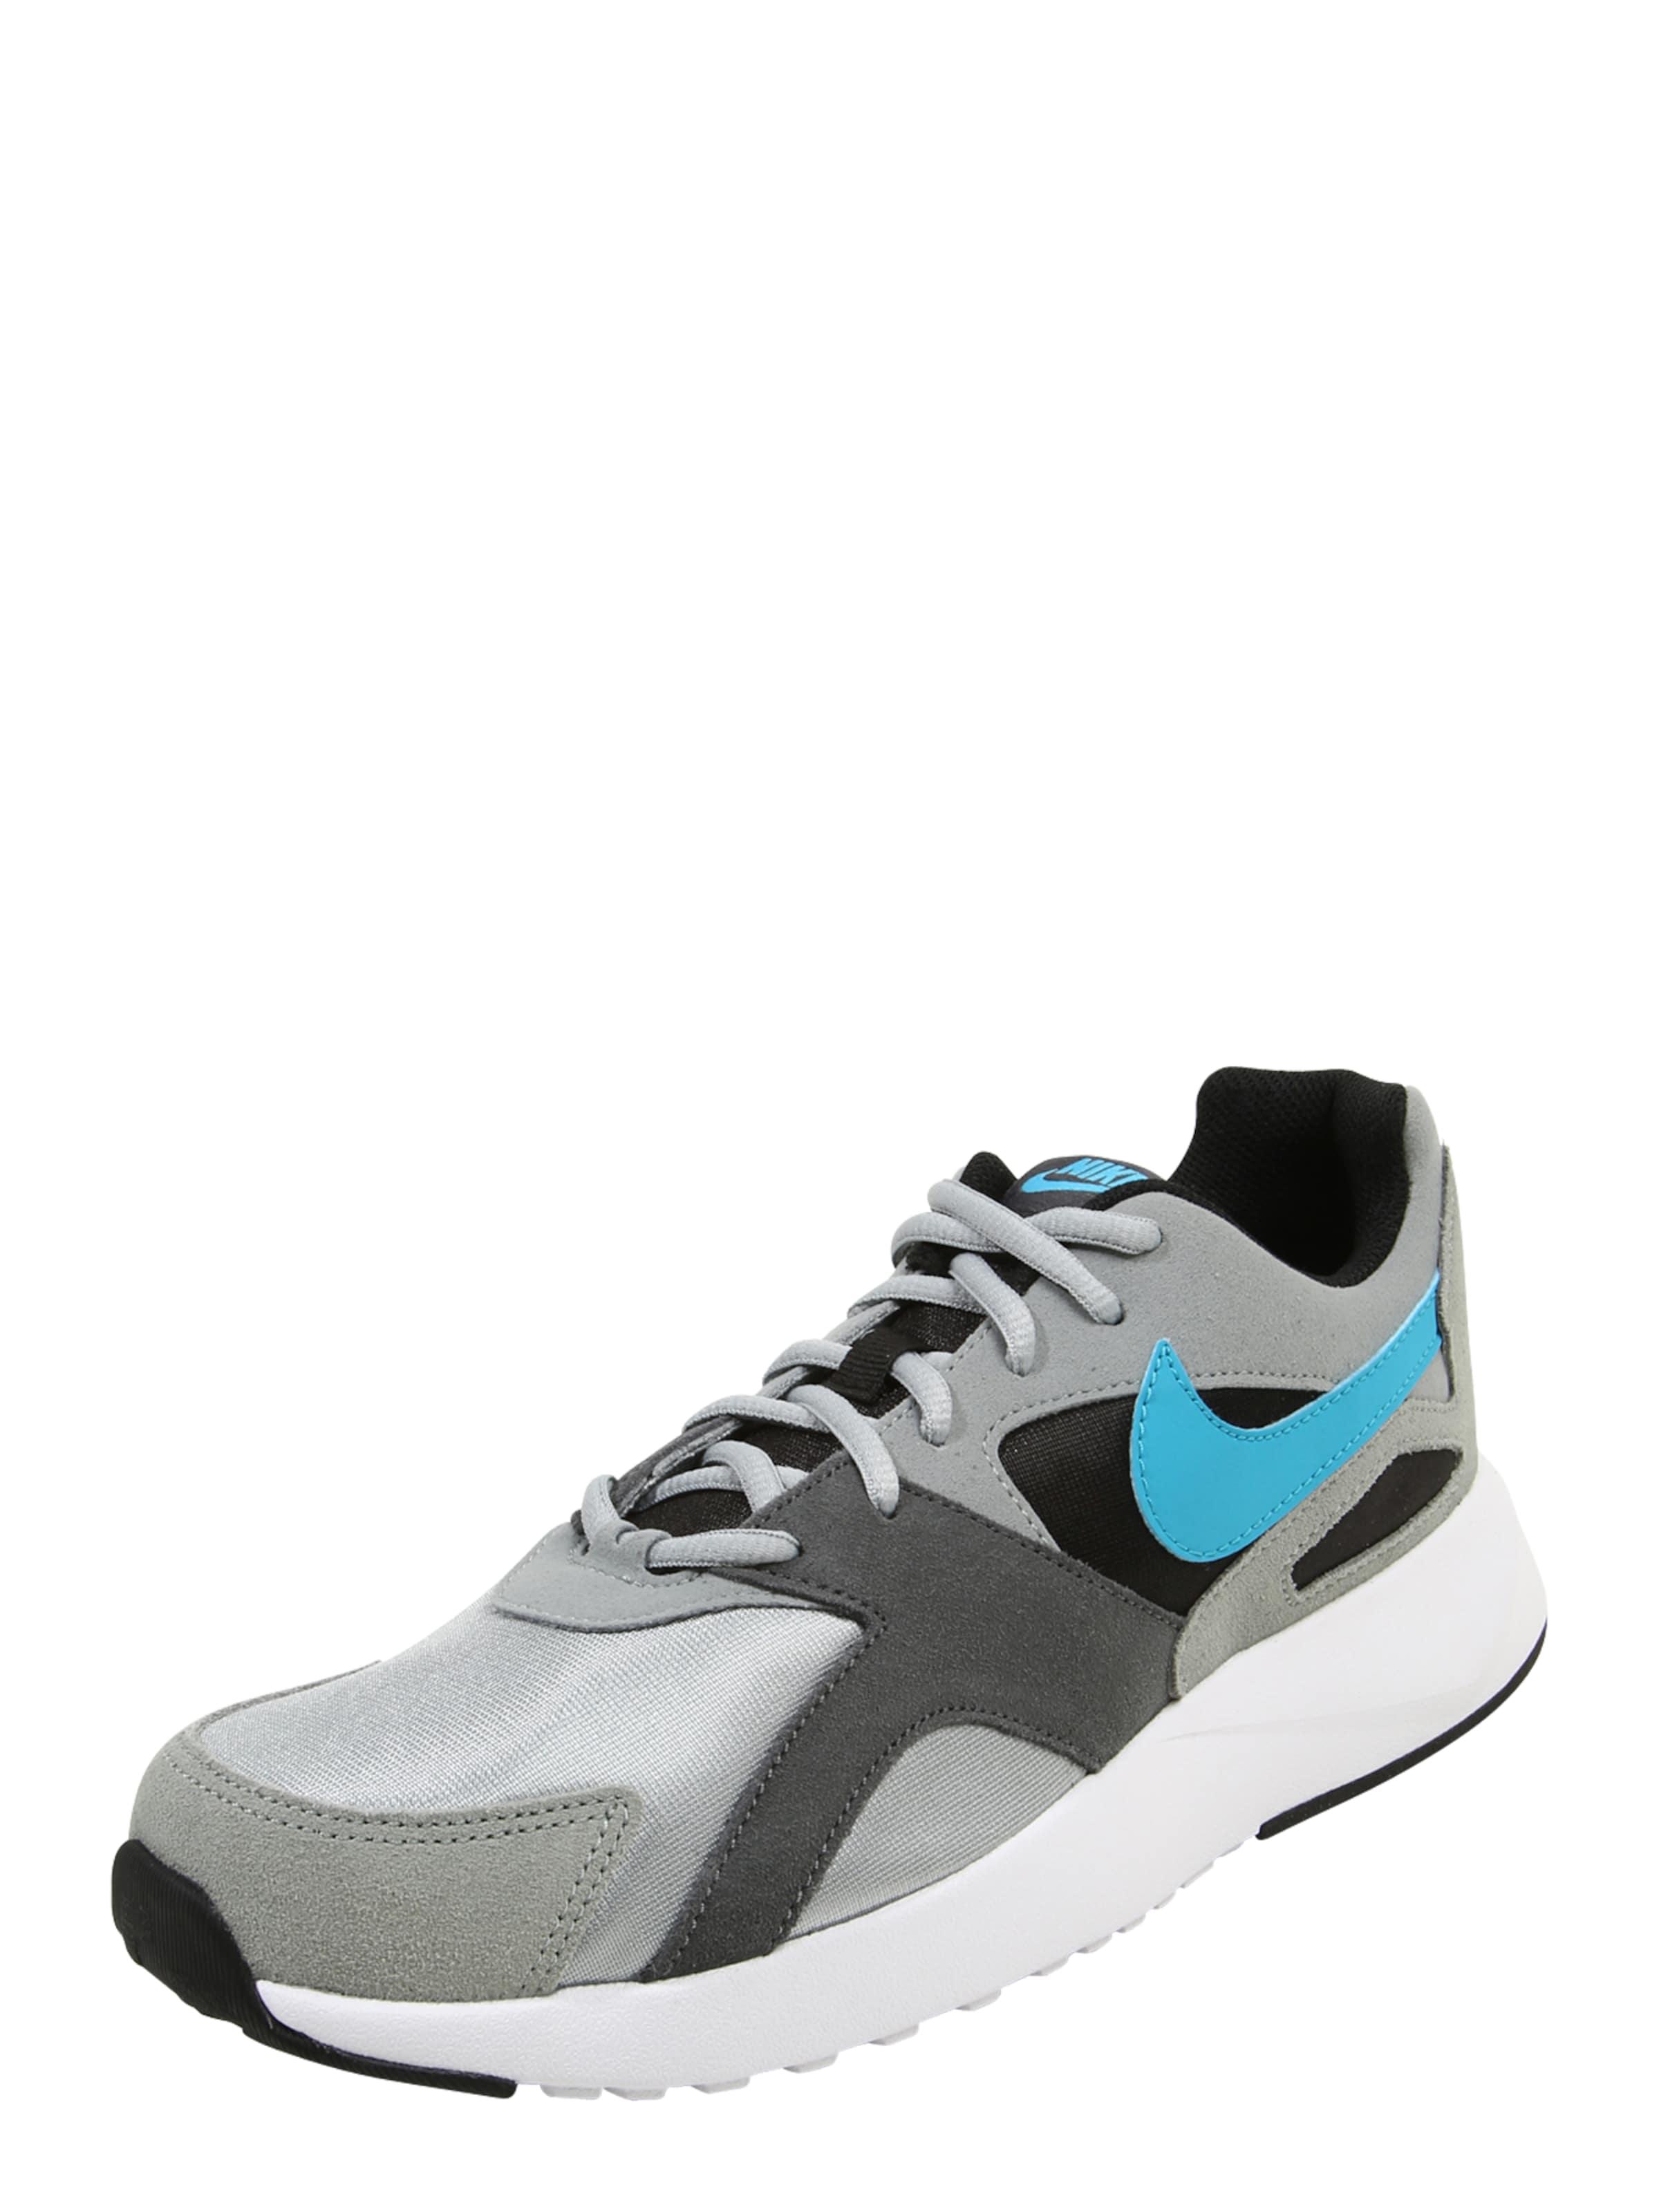 Nike Sneakers Bleu / Gris / Anthracite Couche De Sport Pantheos QAWce4uLb0